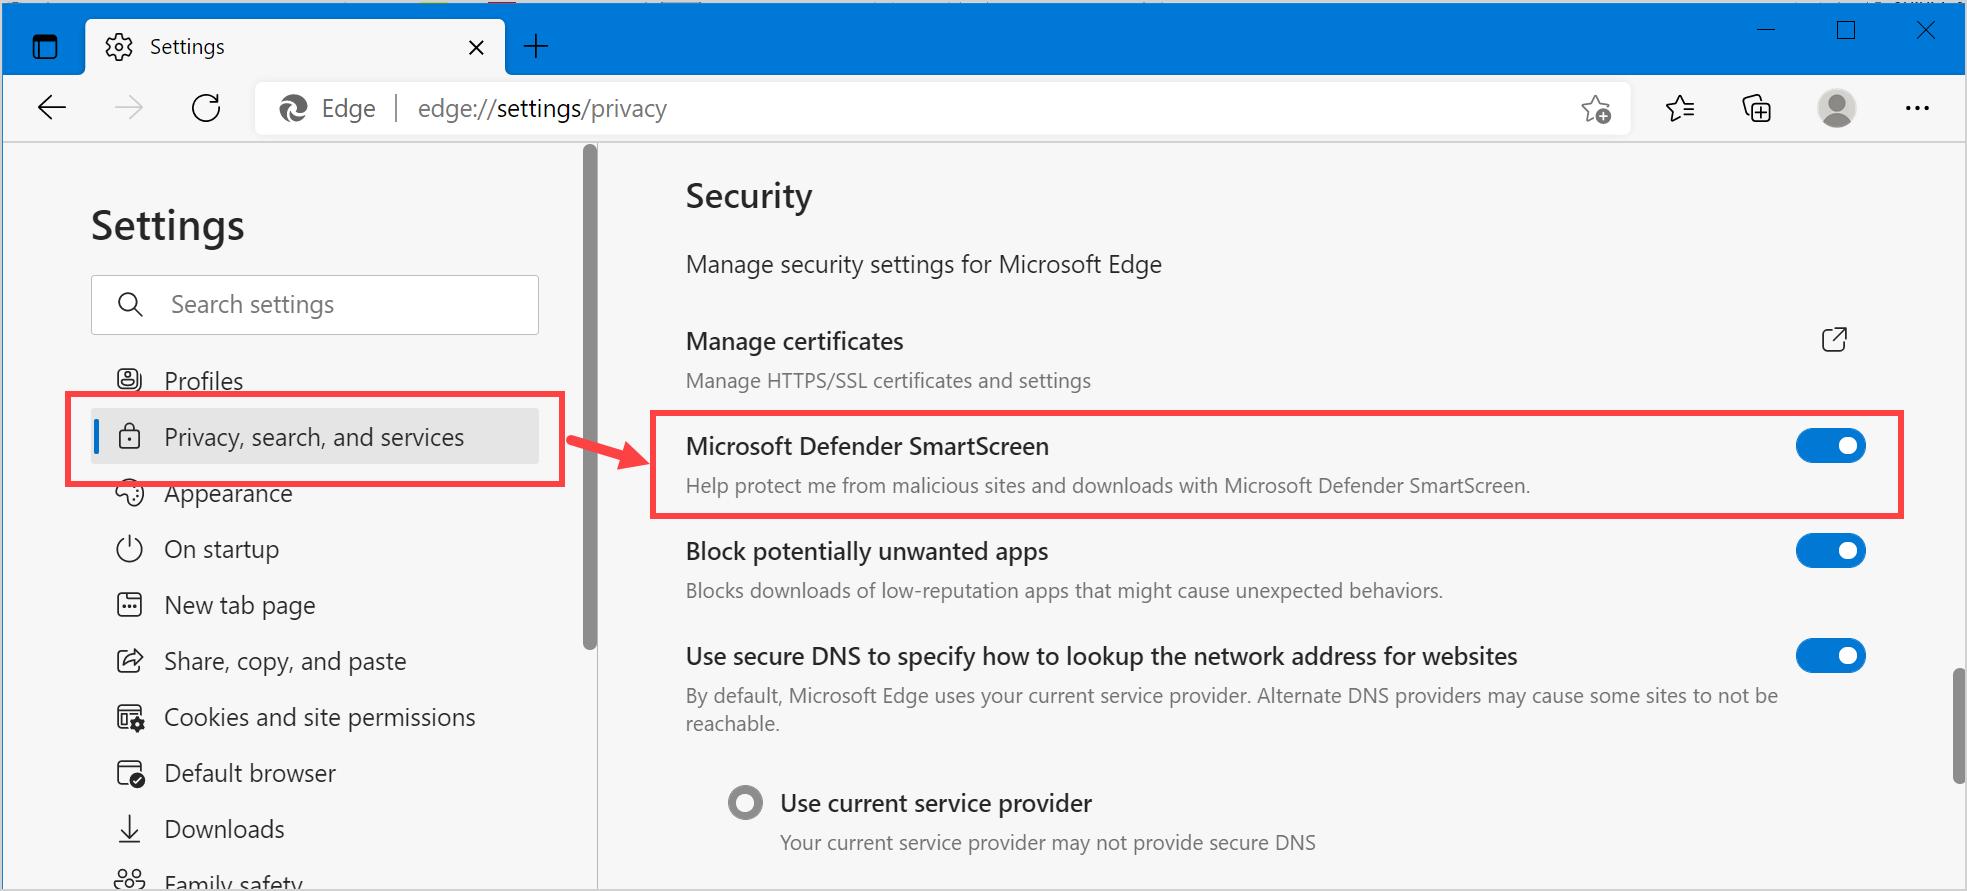 Enable or Disable Microsoft Defender SmartScreen